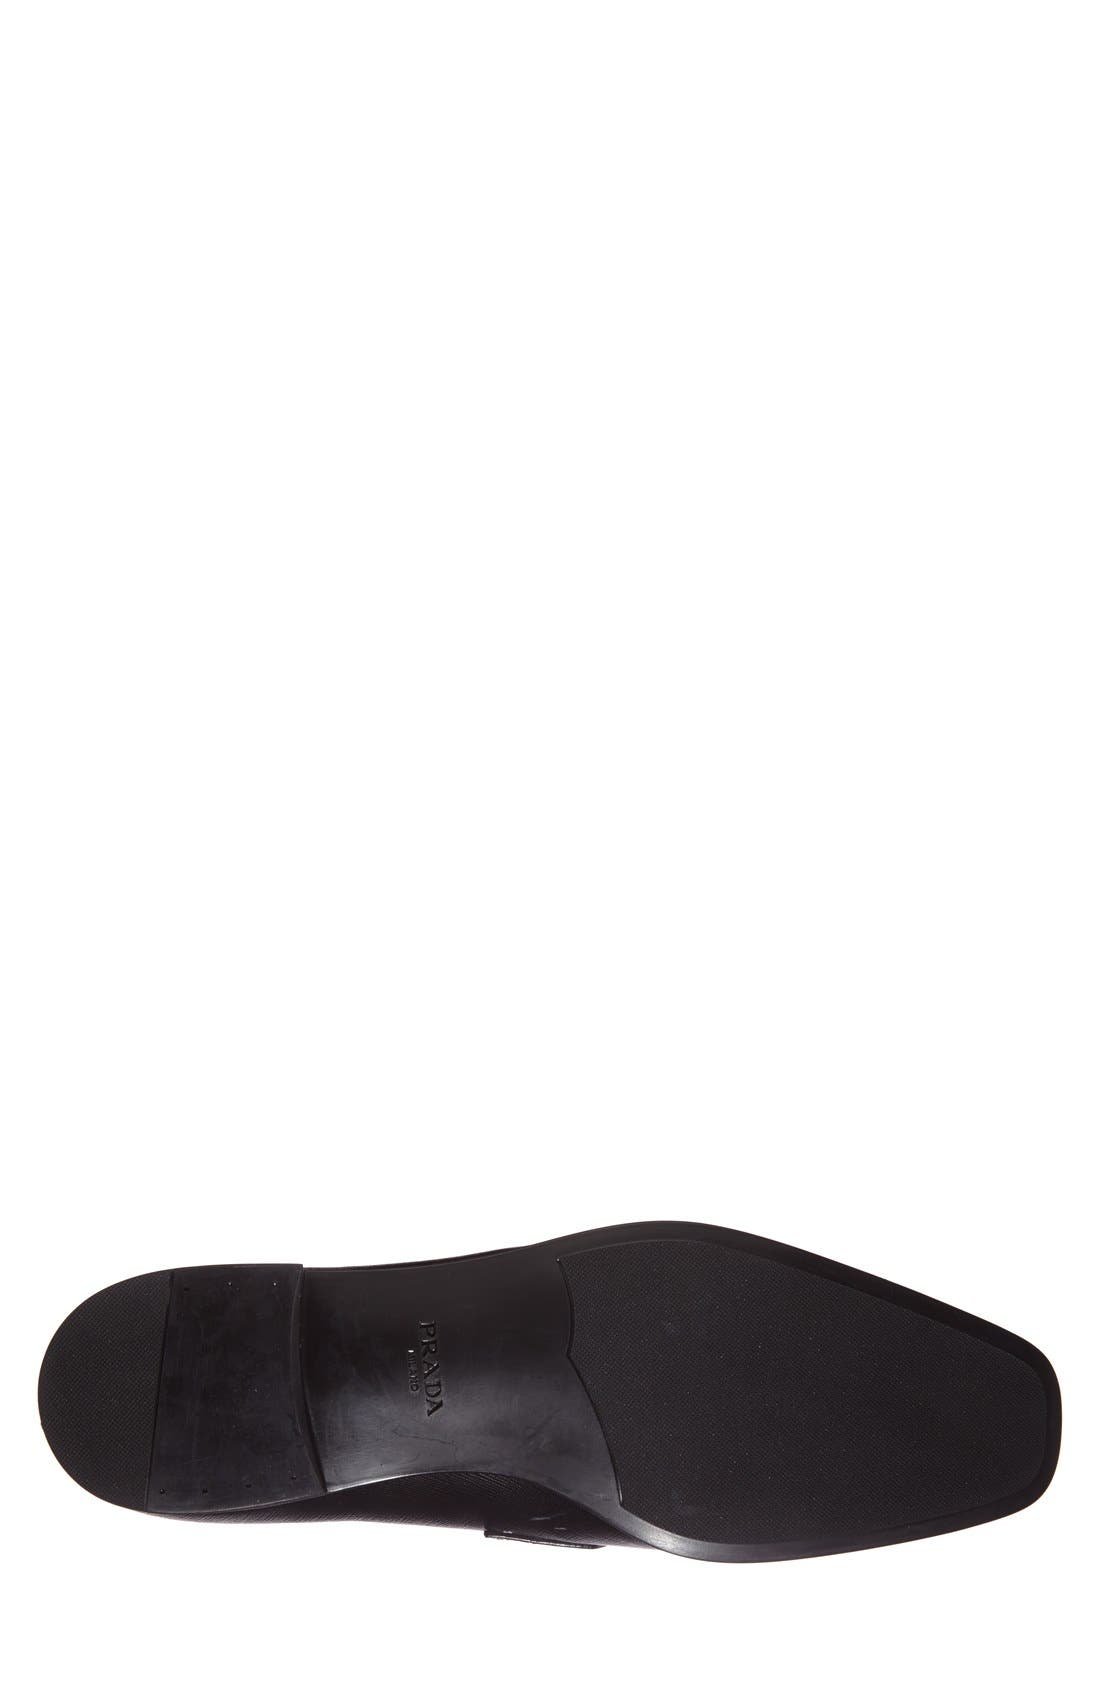 Alternate Image 4  - Prada Saffiano Leather Penny Loafer (Men)